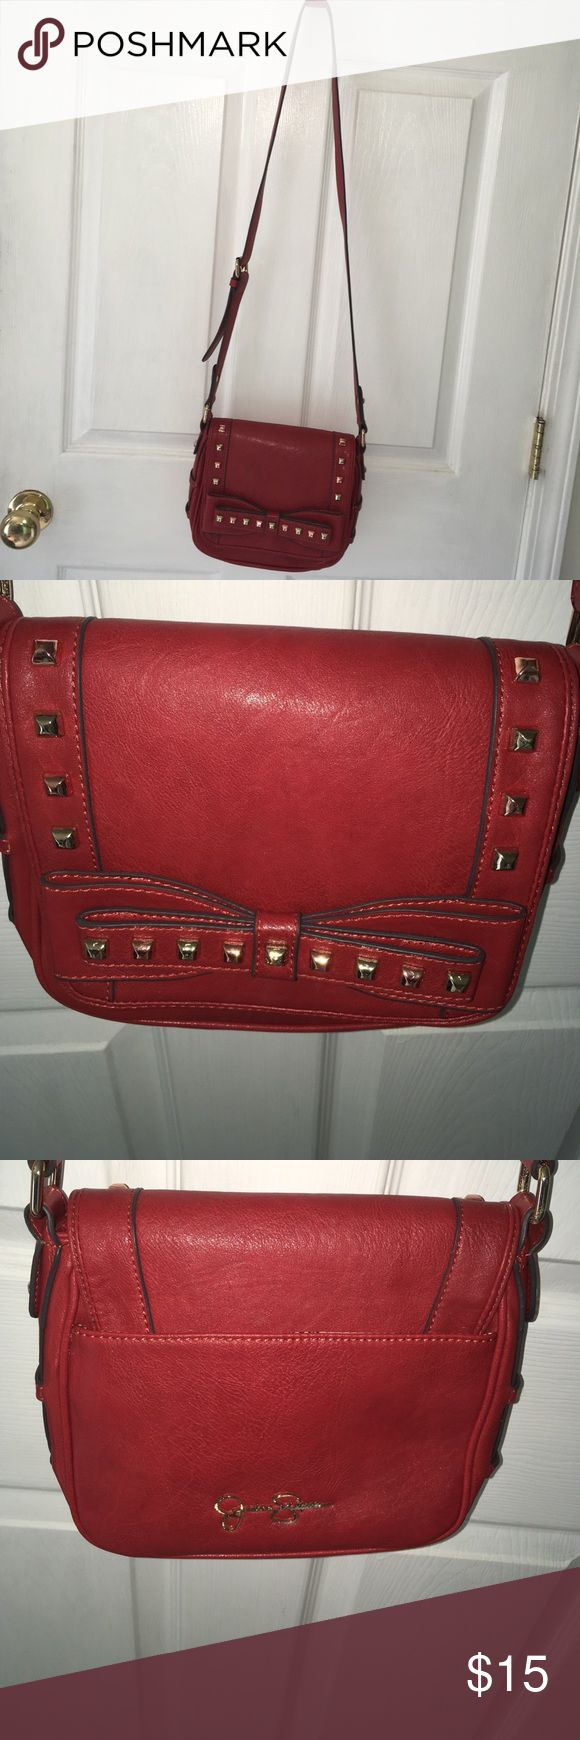 Jessica Simpson purse Jessica Simpson crossover purse Jessica Simpson Bags Crossbody Bags